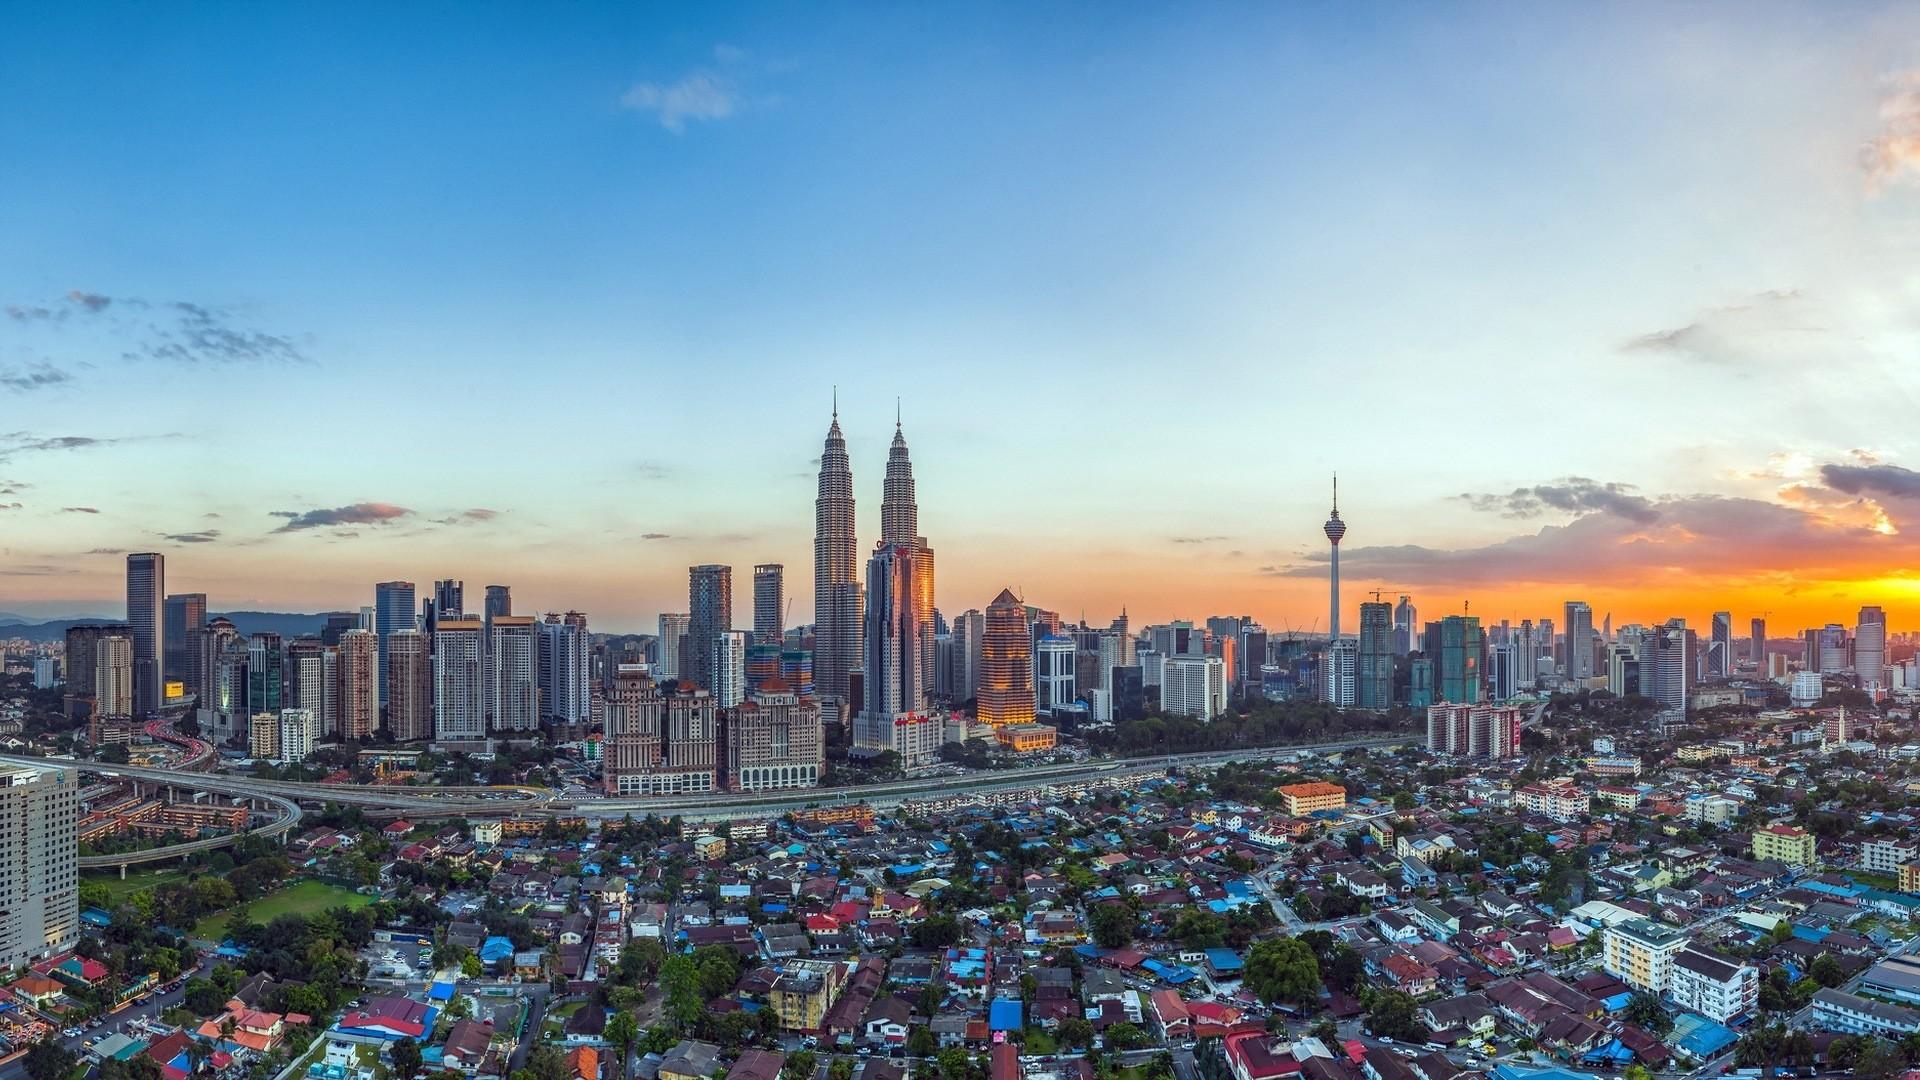 Res: 1920x1080, malaysia, petronas twin towers, sky